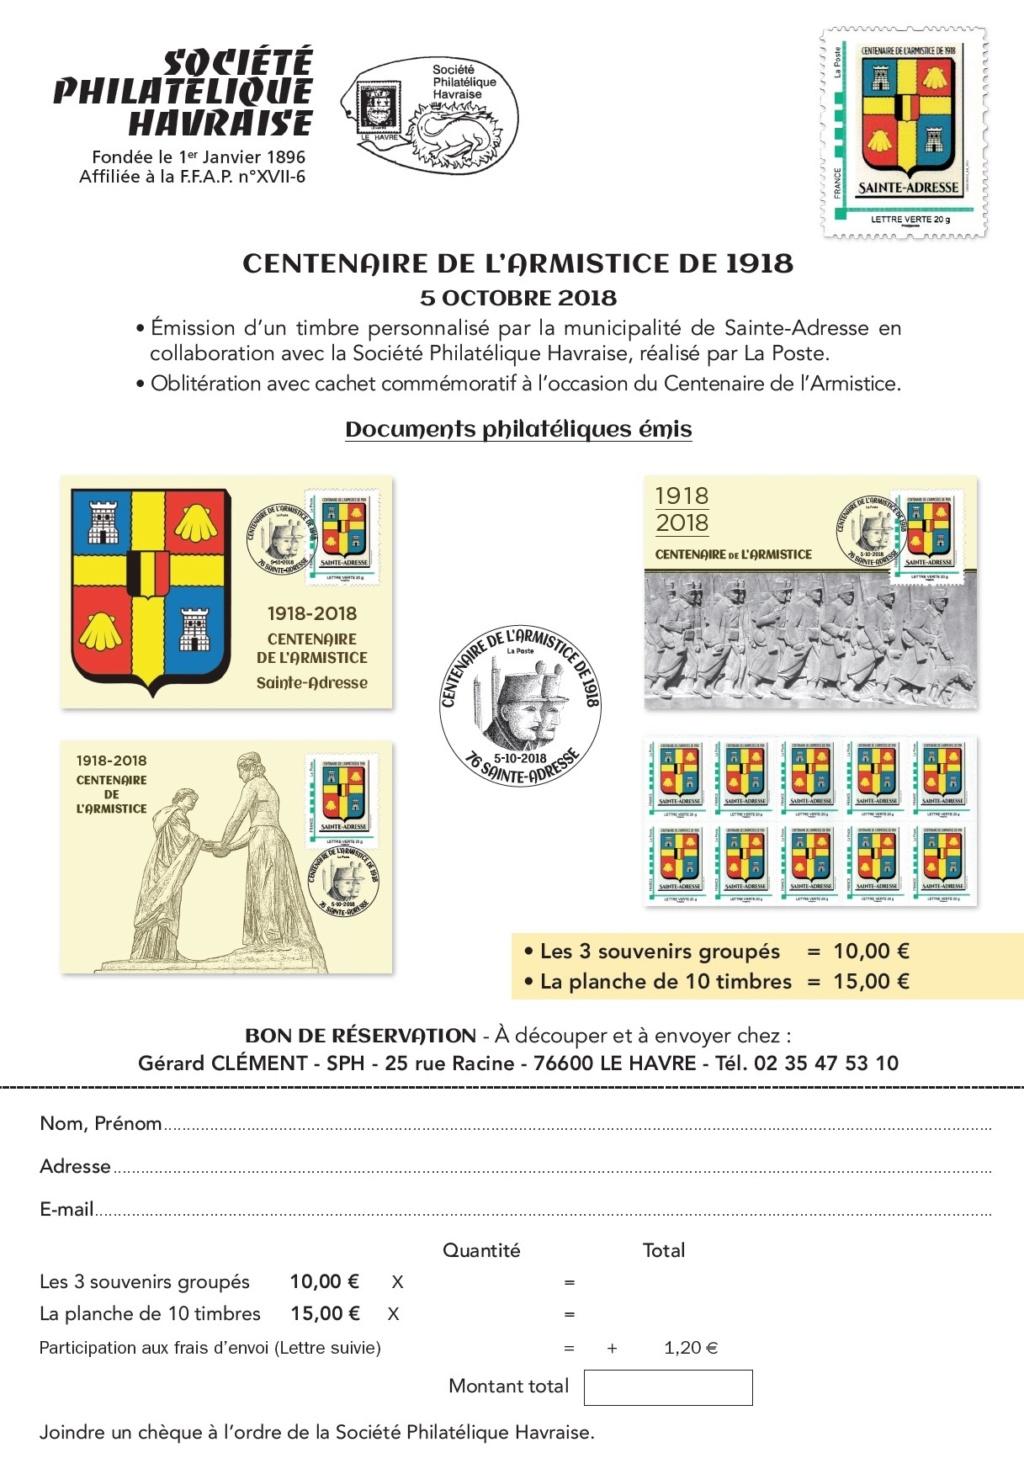 76 - Le Havre - Societe Philatelique Havraise Havre10